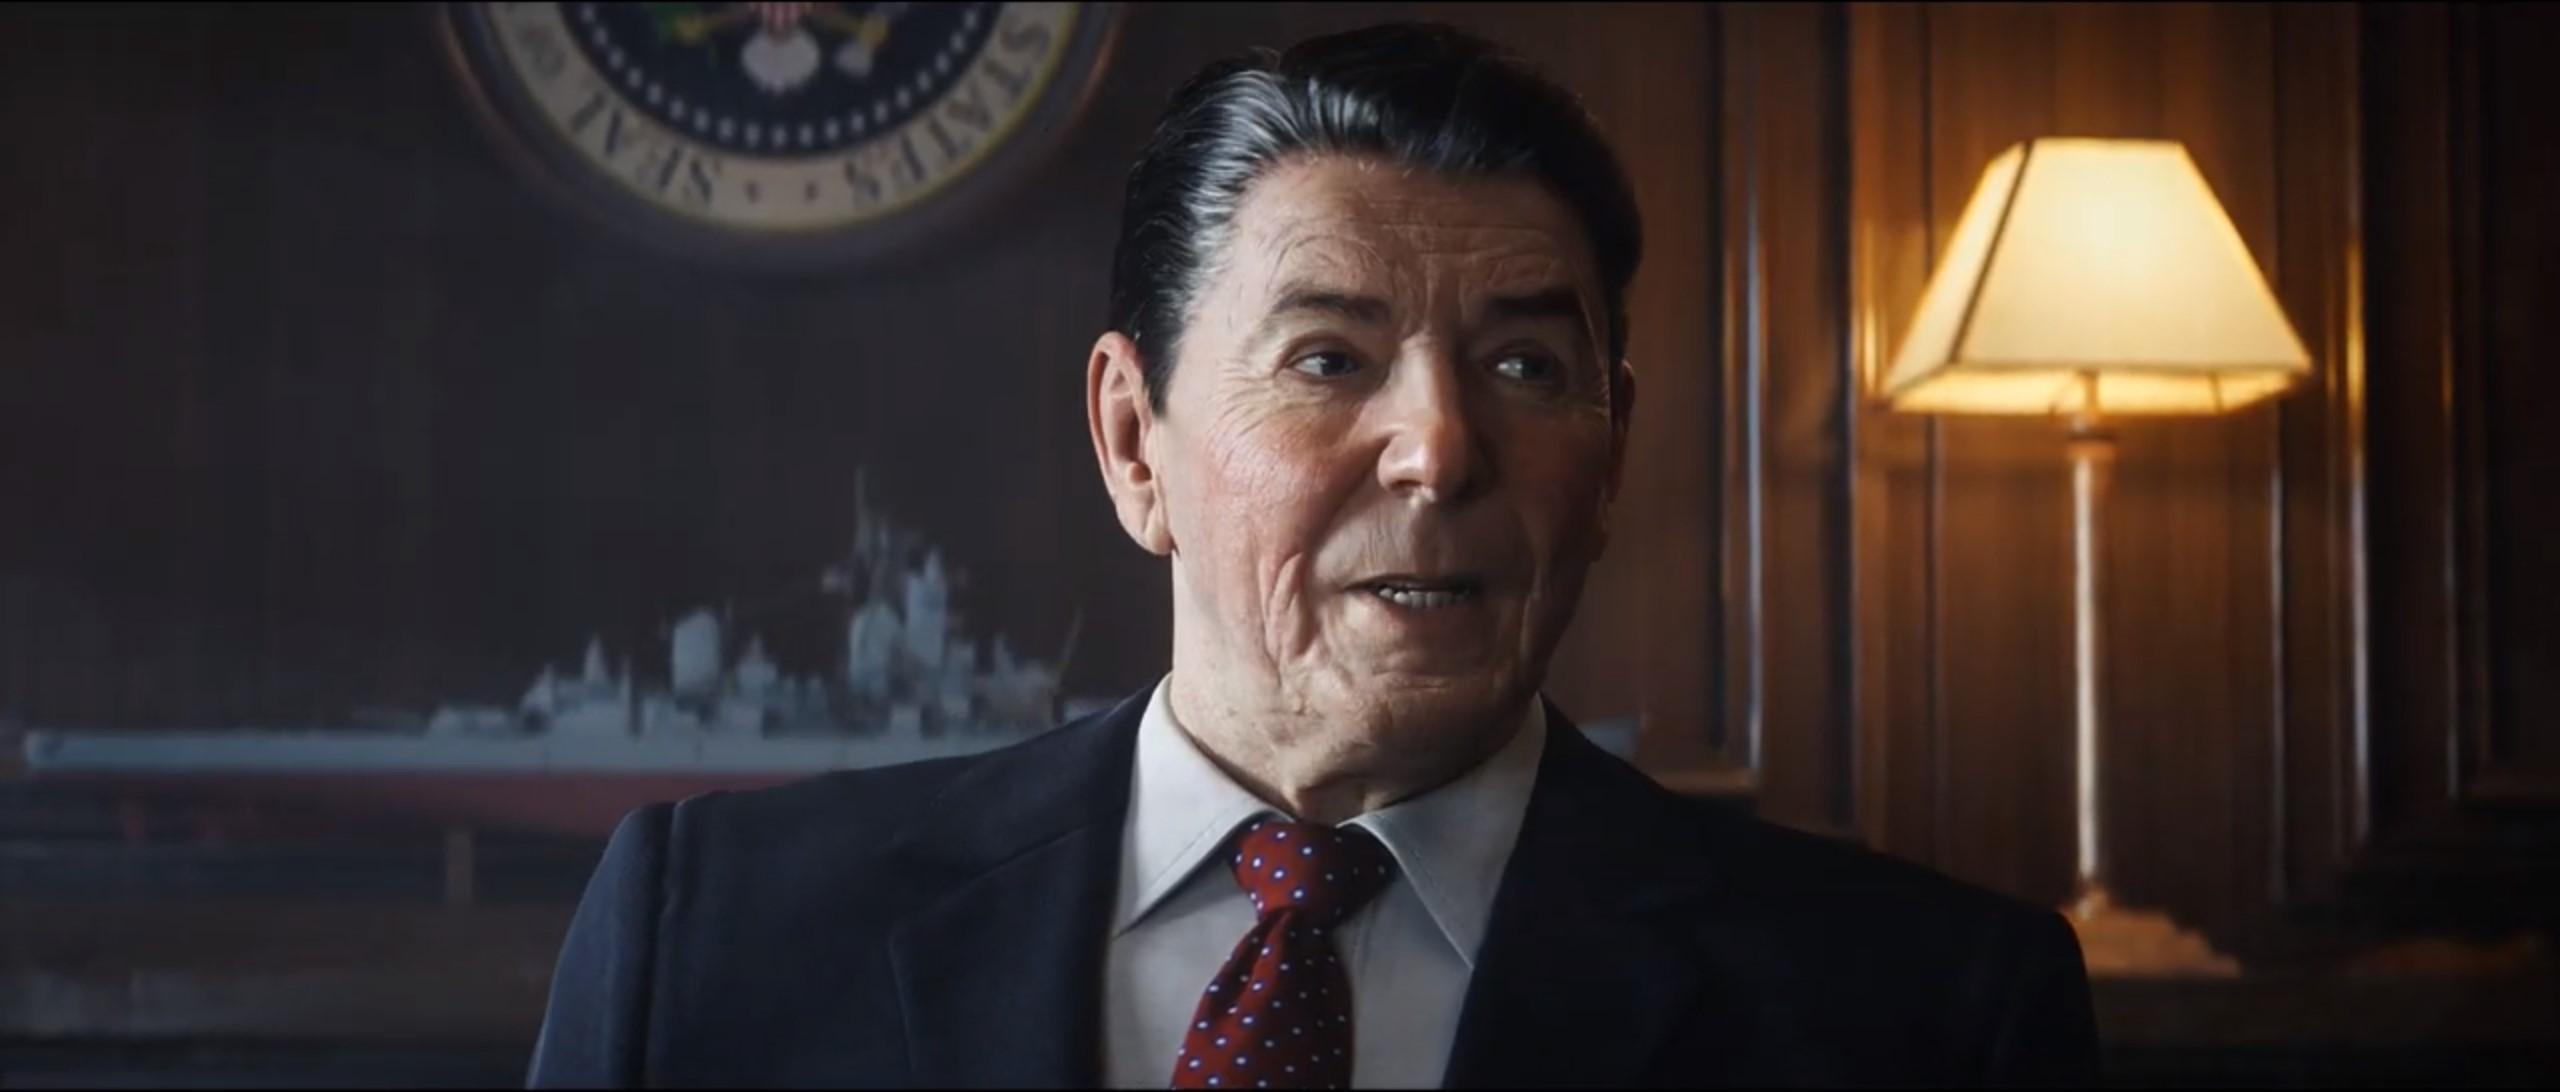 Ronald Reagan in Call of Duty